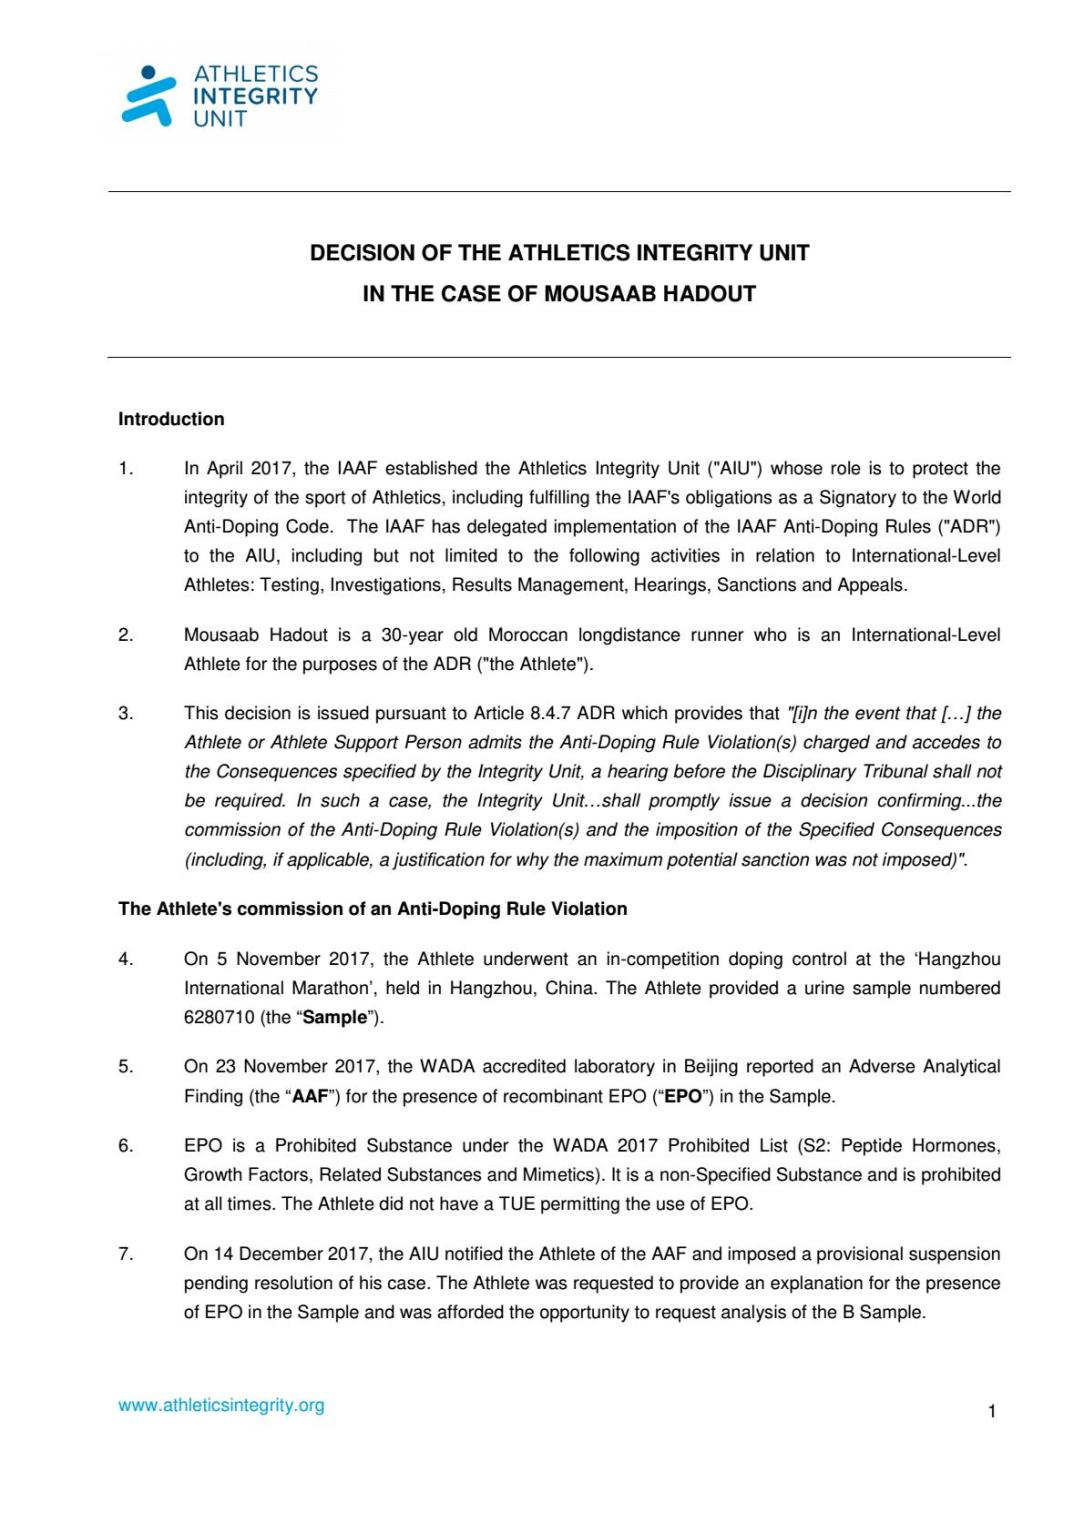 AIU-17-326-Moussaab-HADOUT-AIU-decision-EN - Página 1